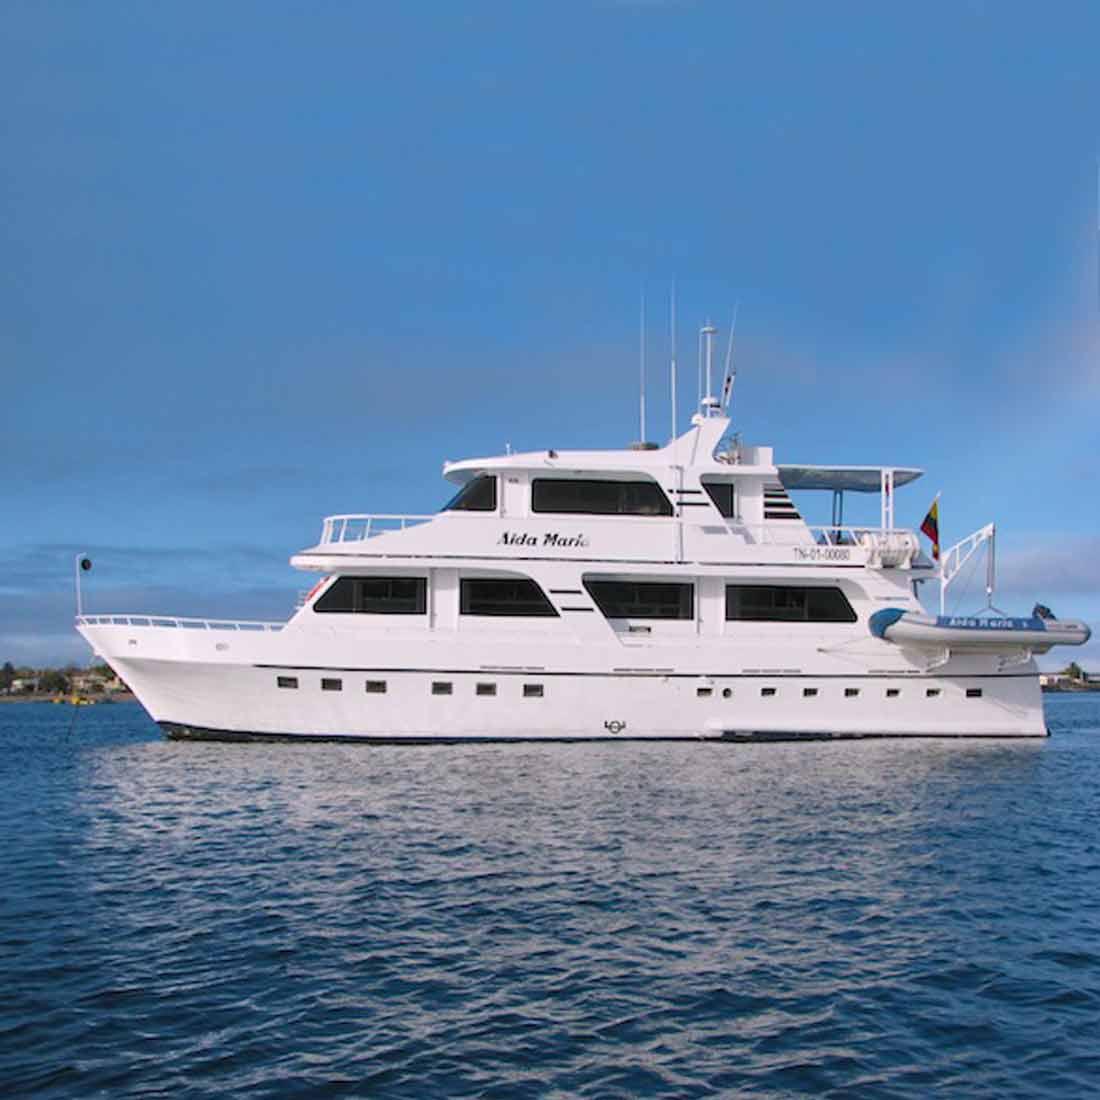 Aida Maria tourist yacht galapagos